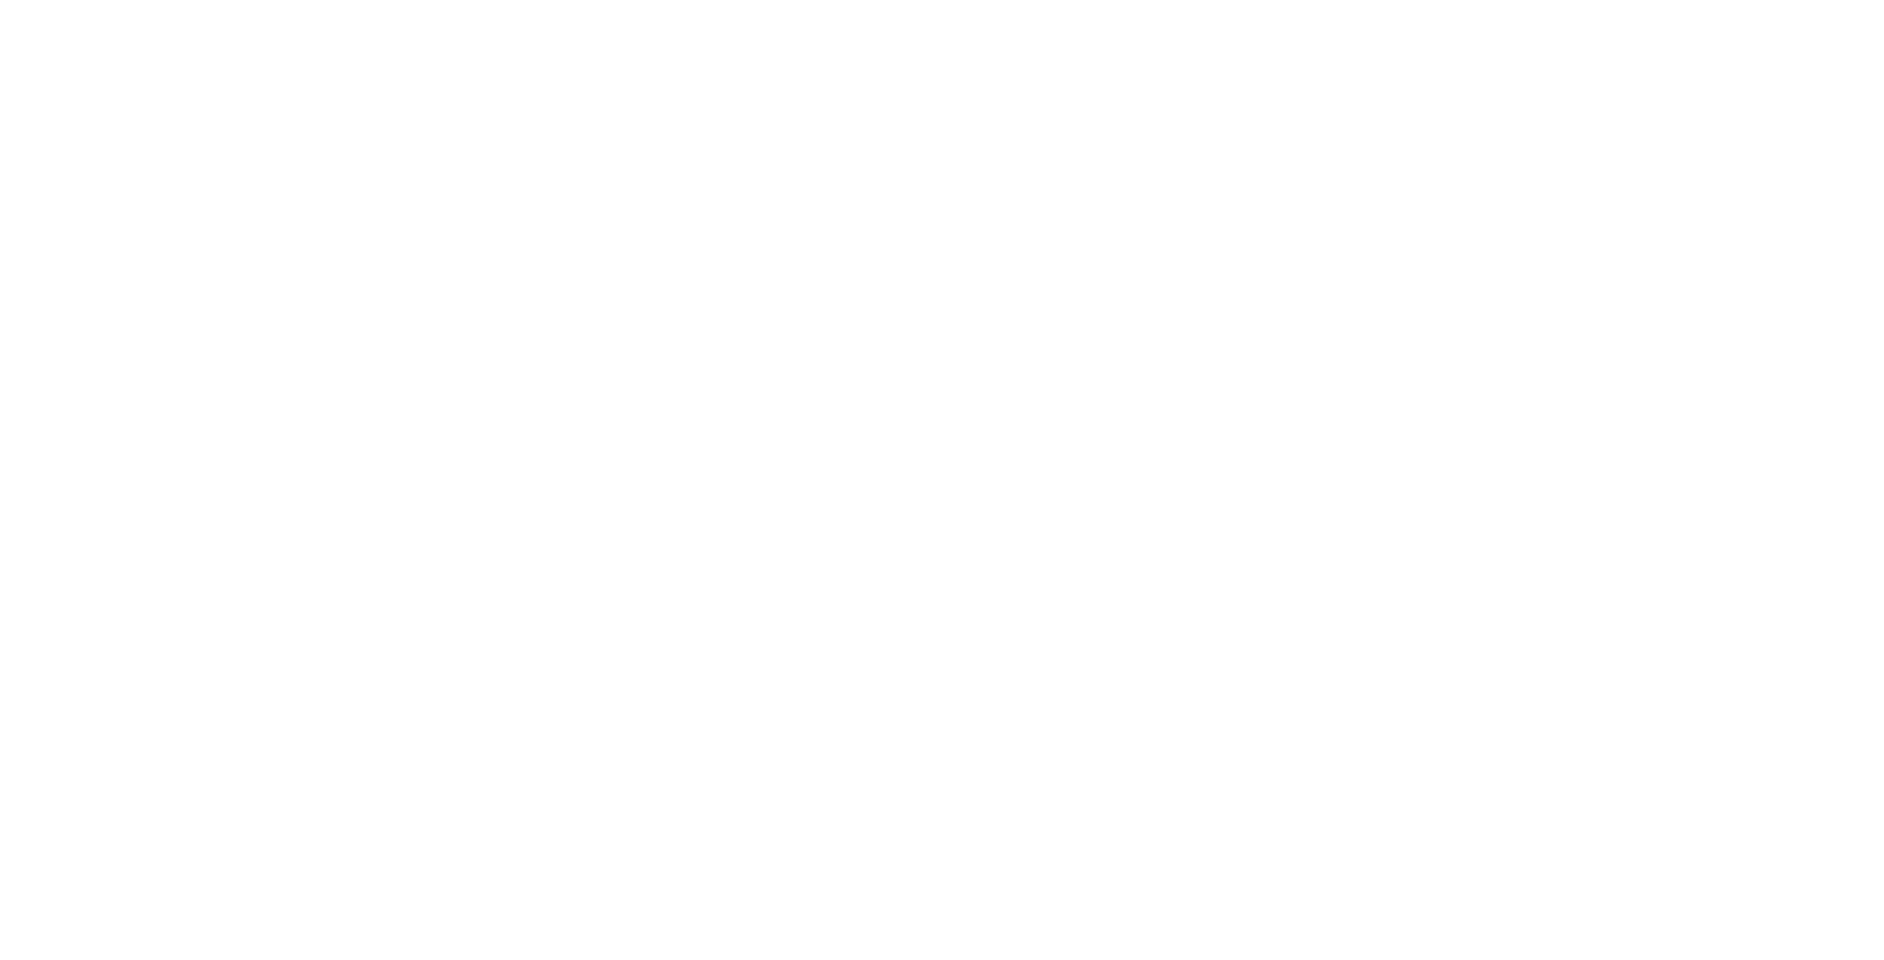 Logo H4D blanc